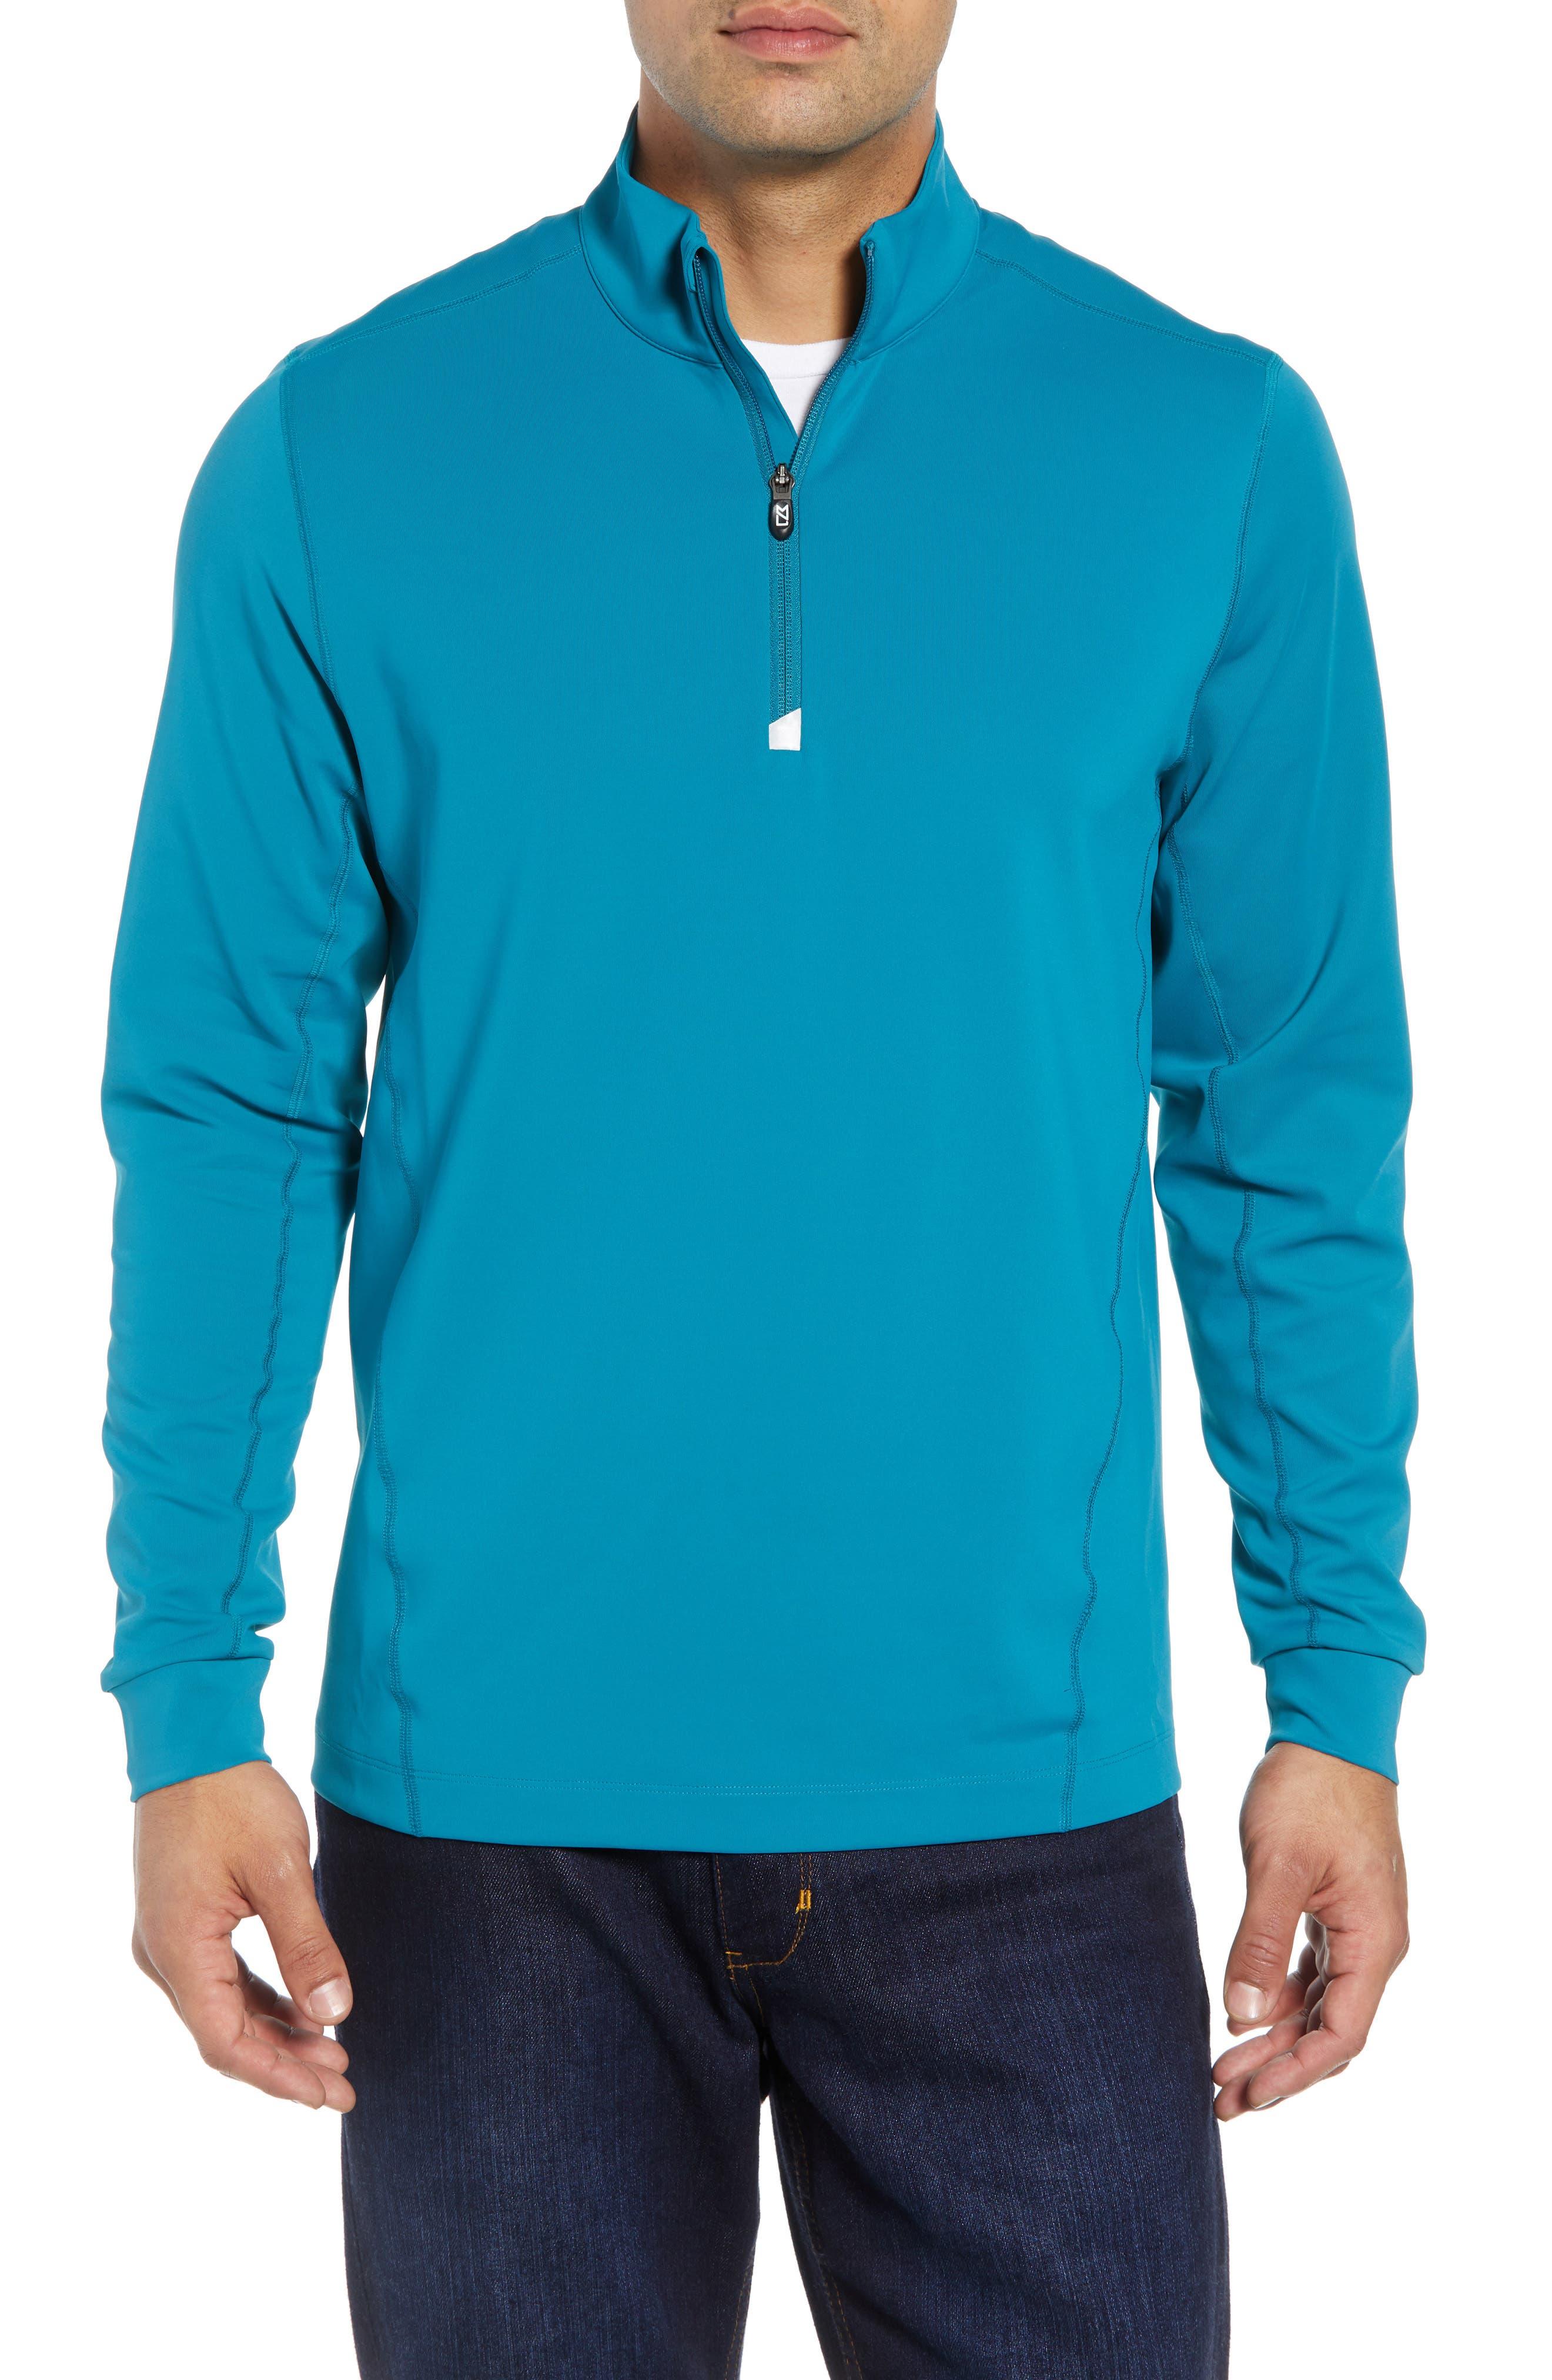 Traverse Regular Fit Quarter Zip Pullover,                             Main thumbnail 1, color,                             TEAL BLUE